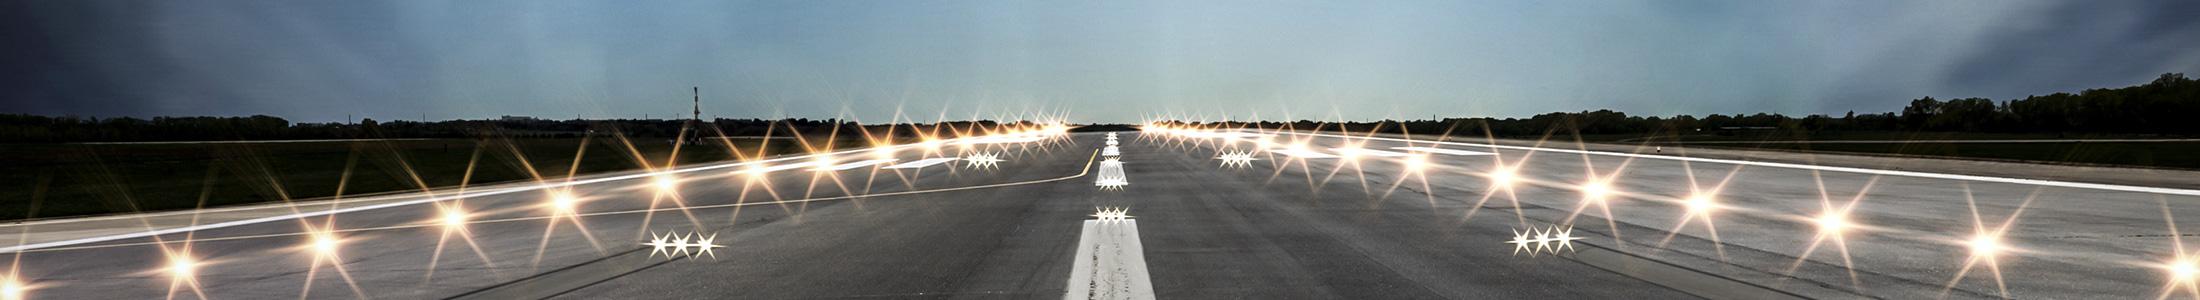 Luftfahrt, Aviation